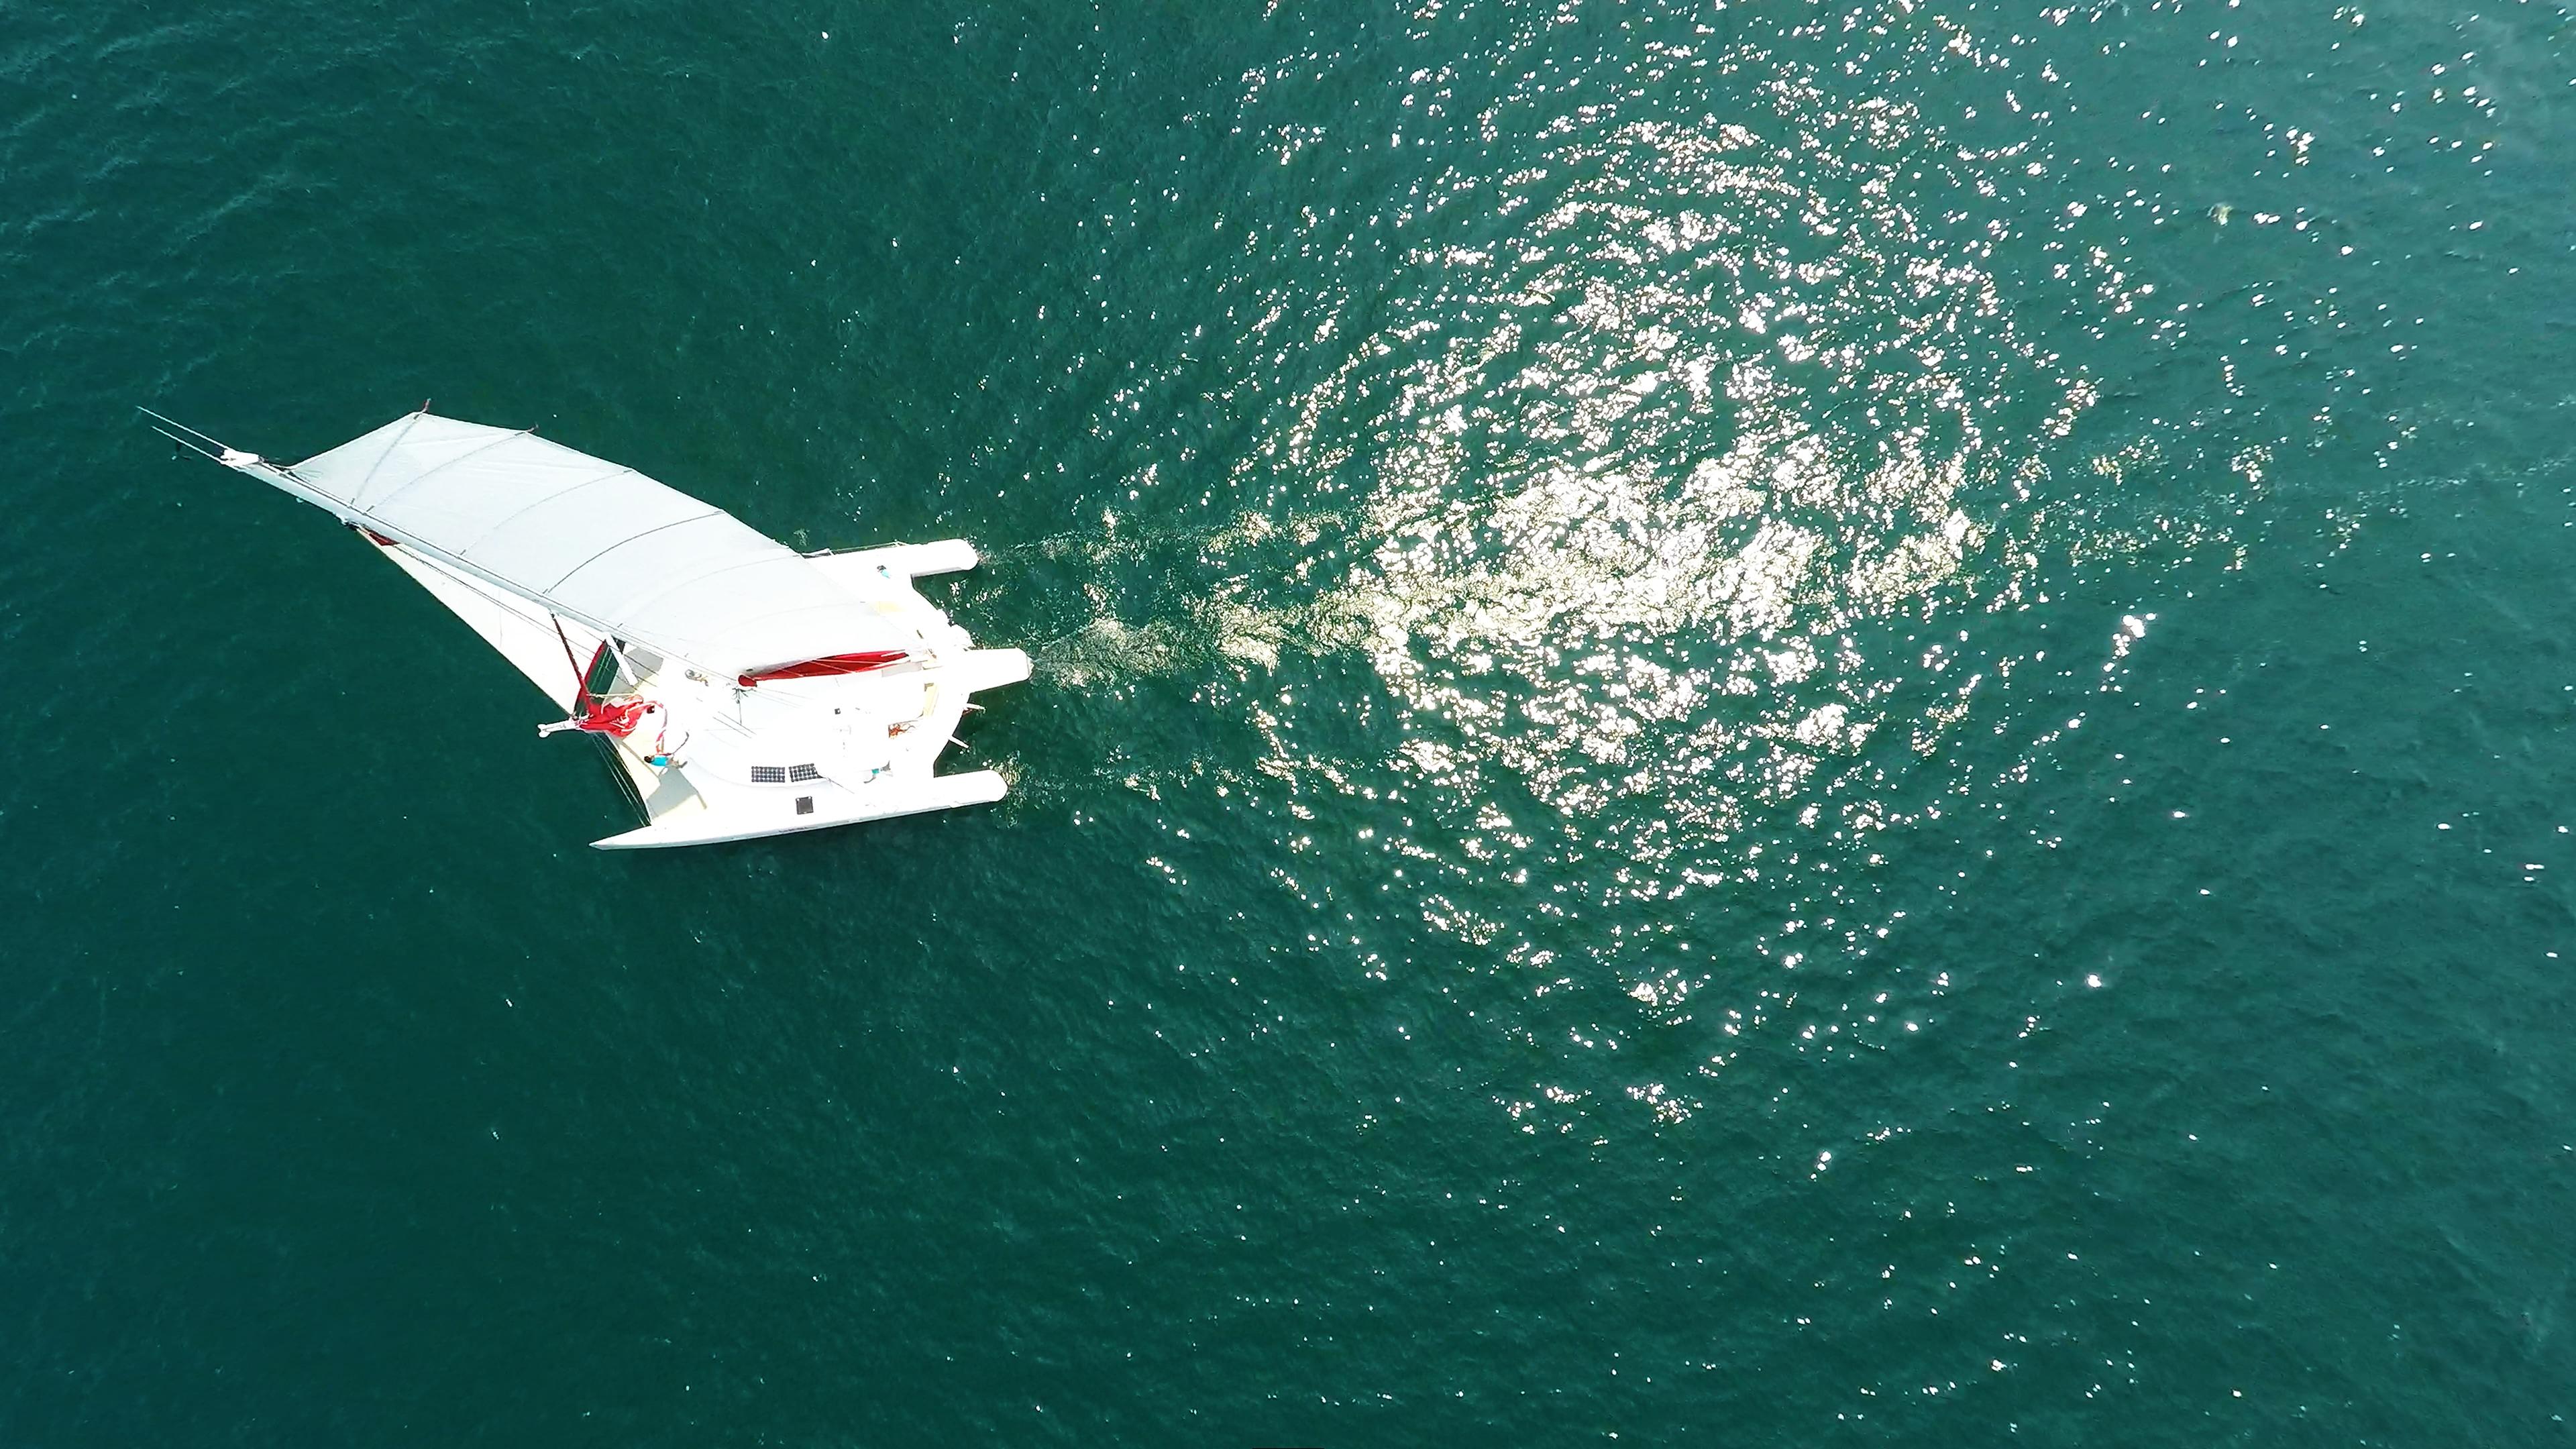 nadir aerea verticale giù foto trimarano barca a vela